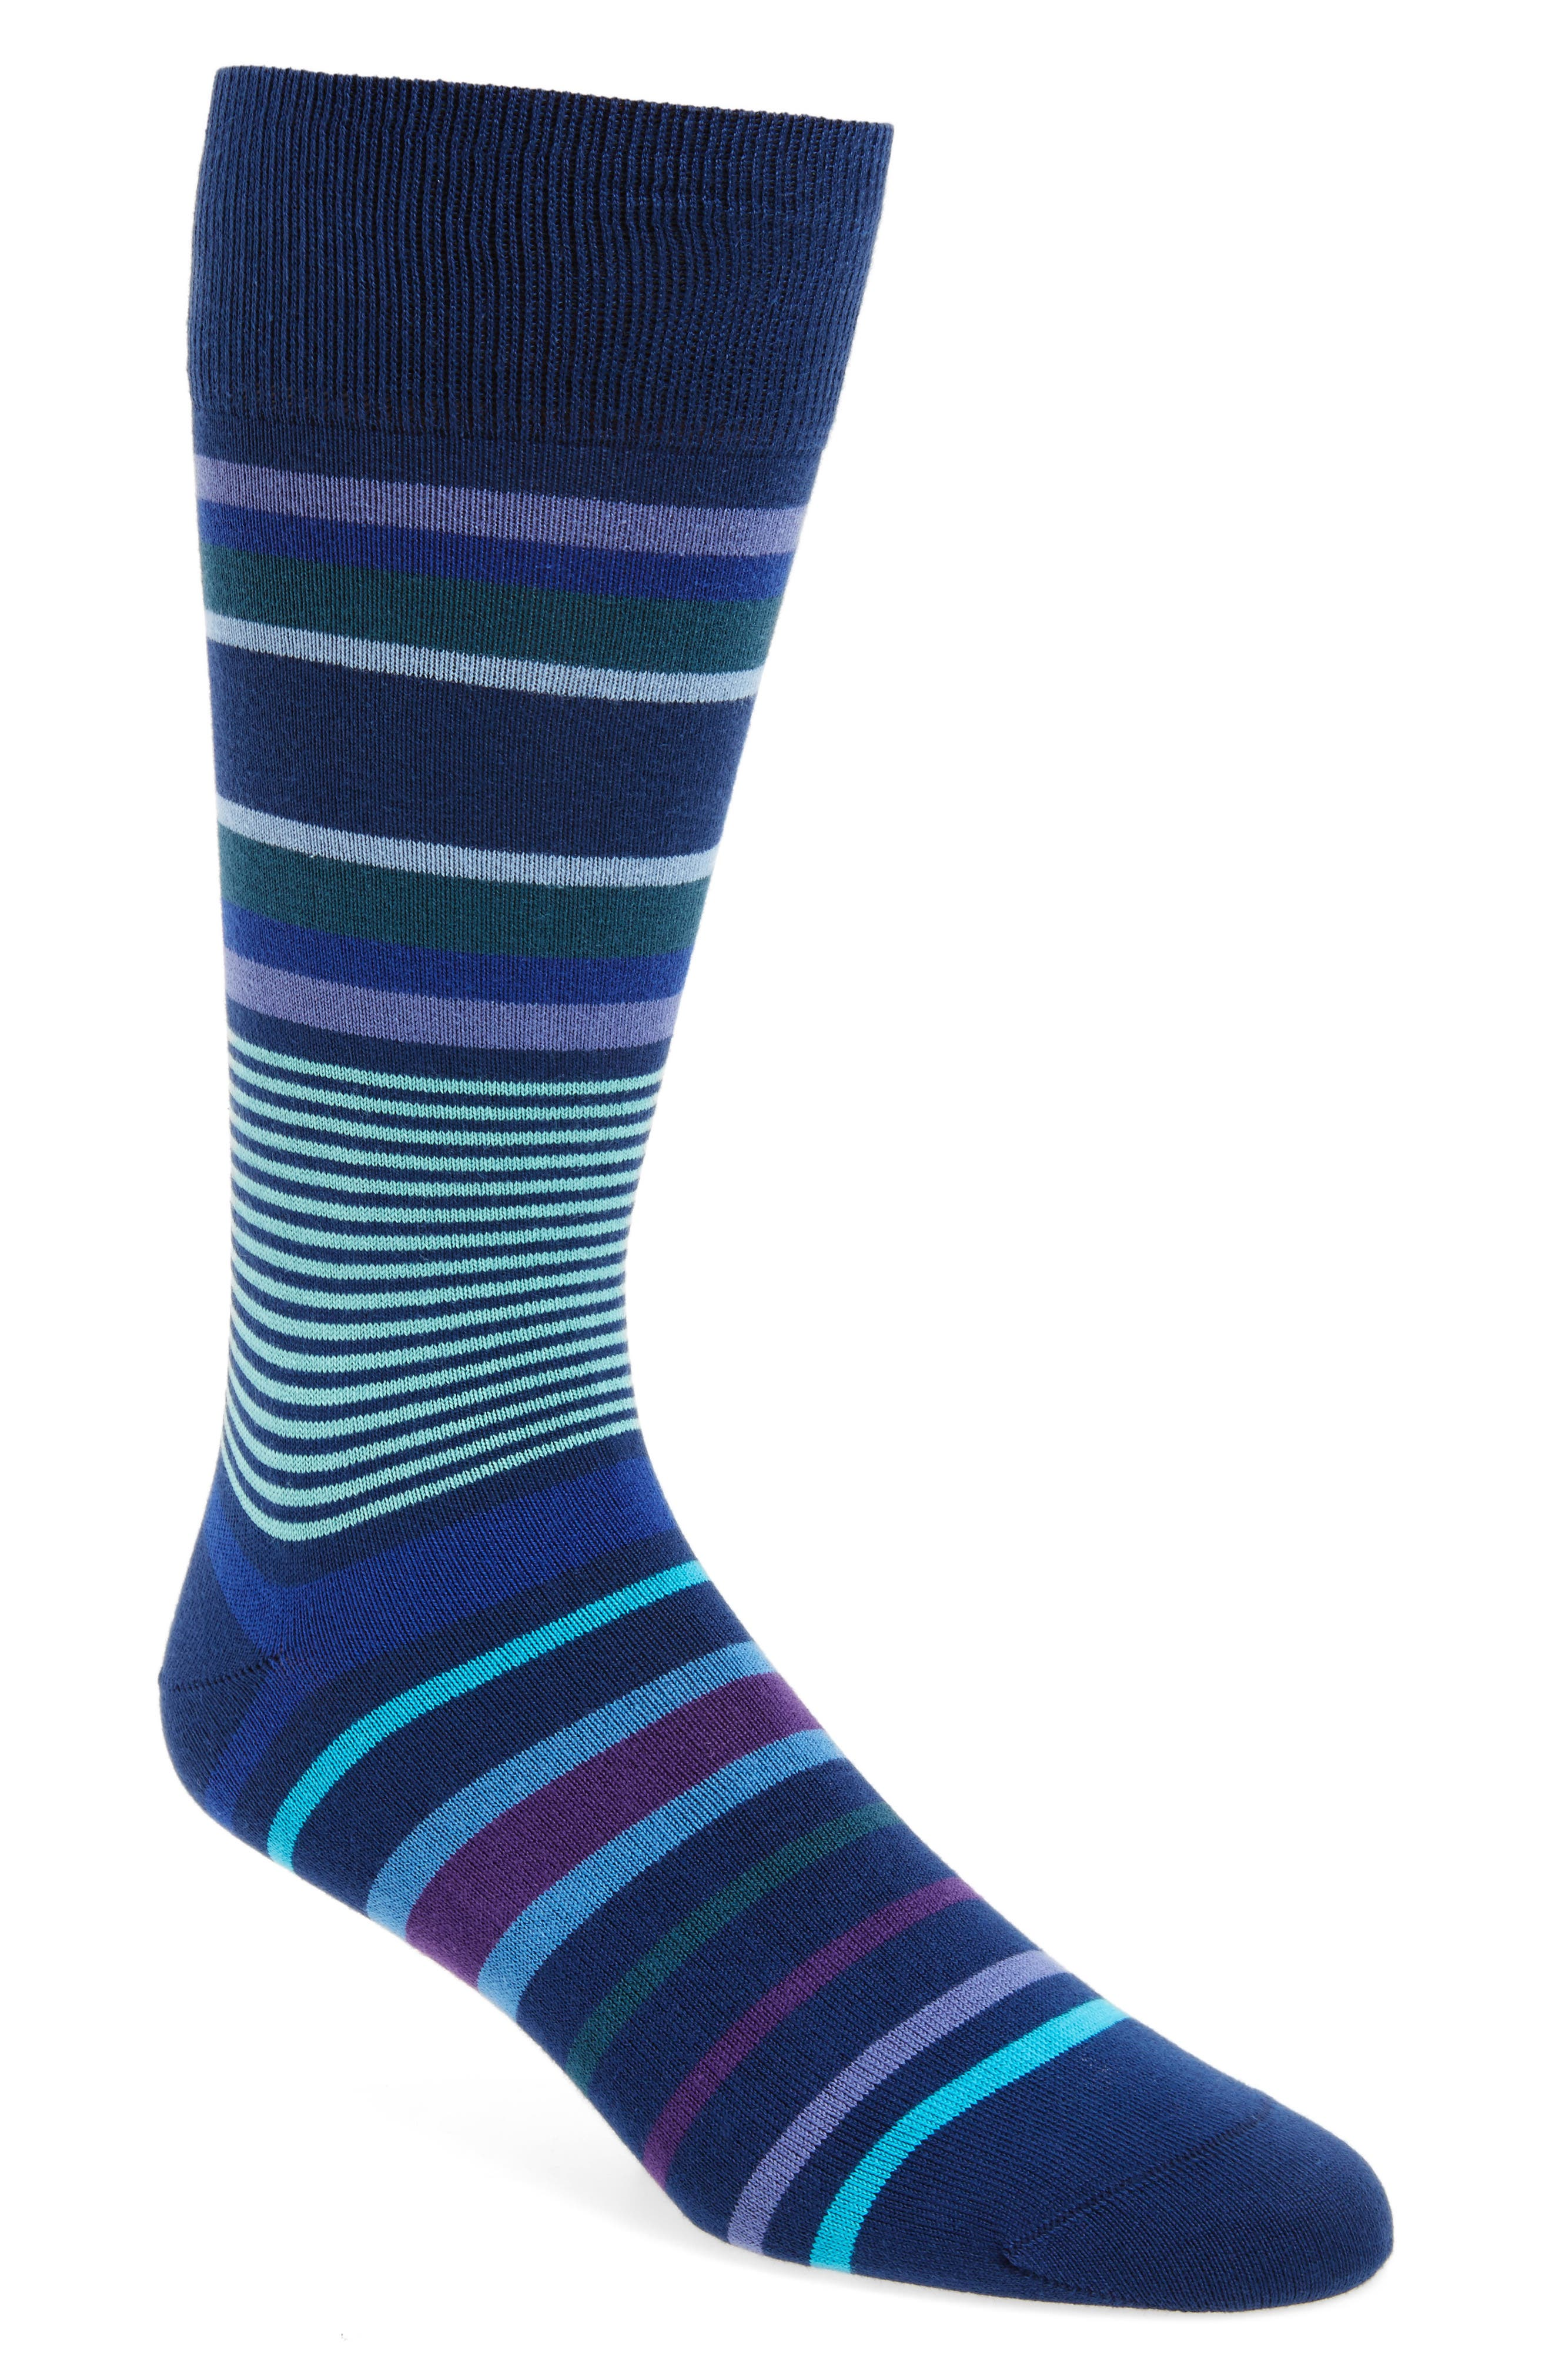 Lawn Stripe Socks,                         Main,                         color, Blue